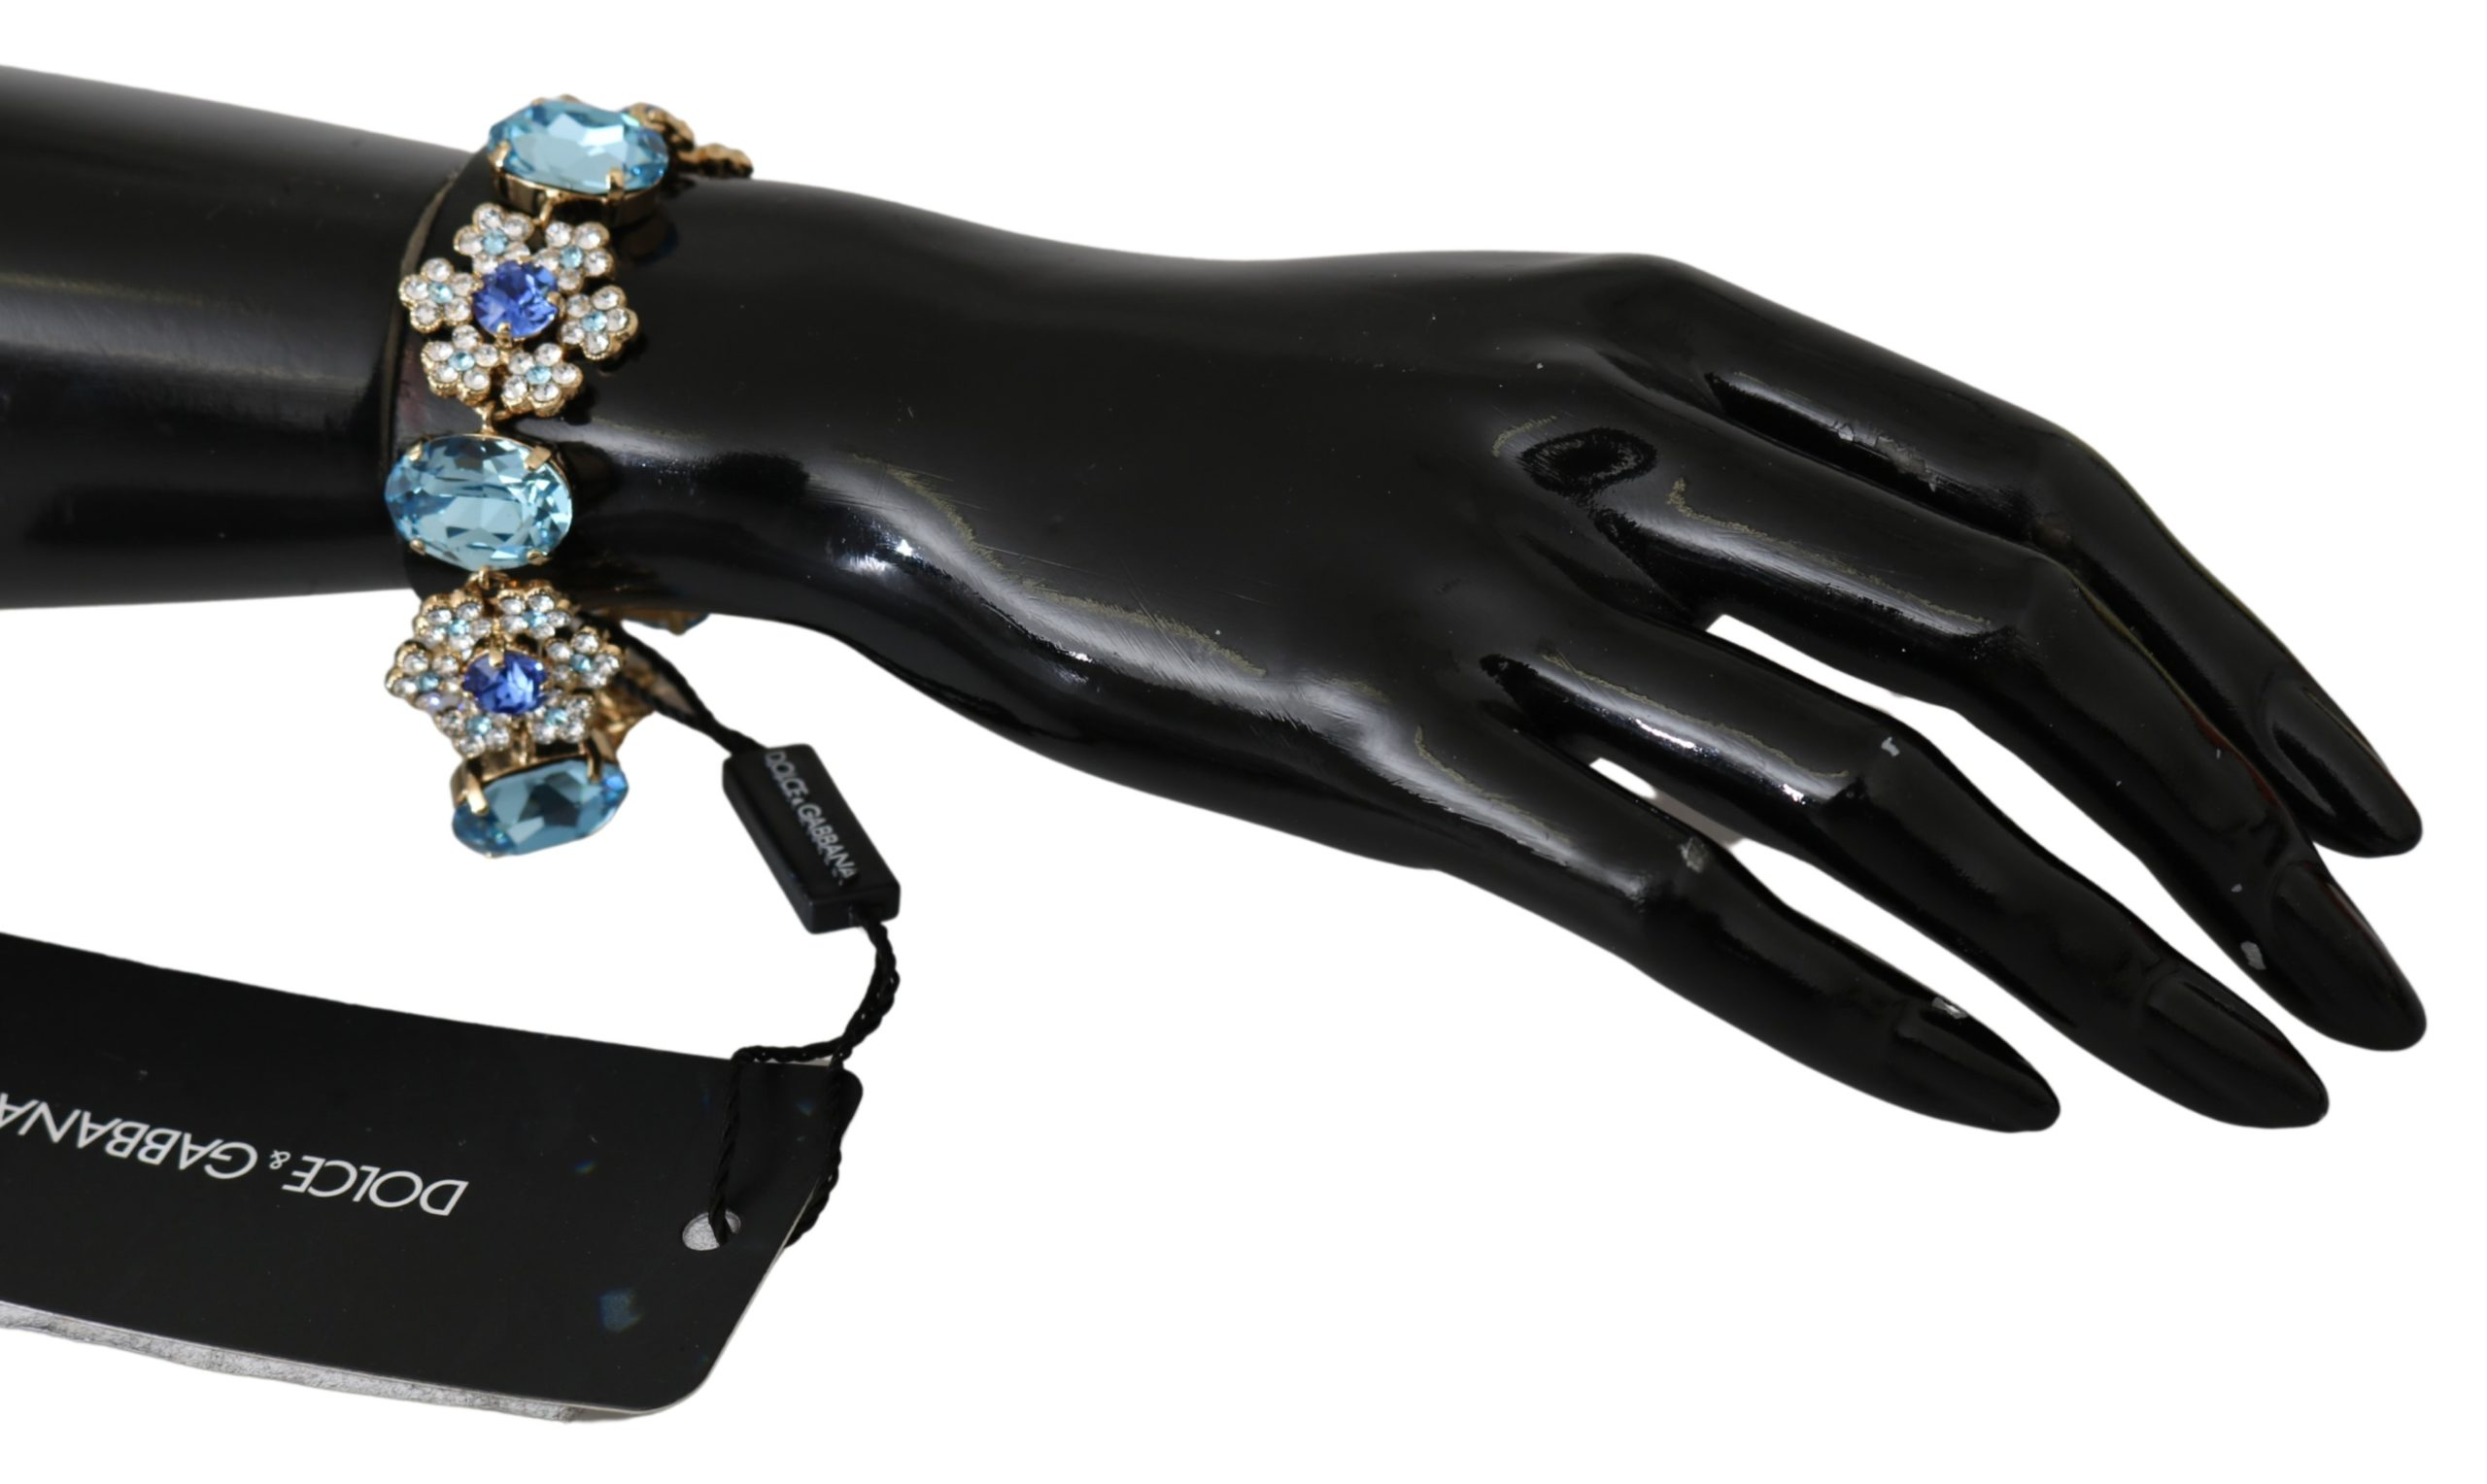 Dolce & Gabbana Women's Crystal Snowflake Charms Bracelet Gold SMY100140